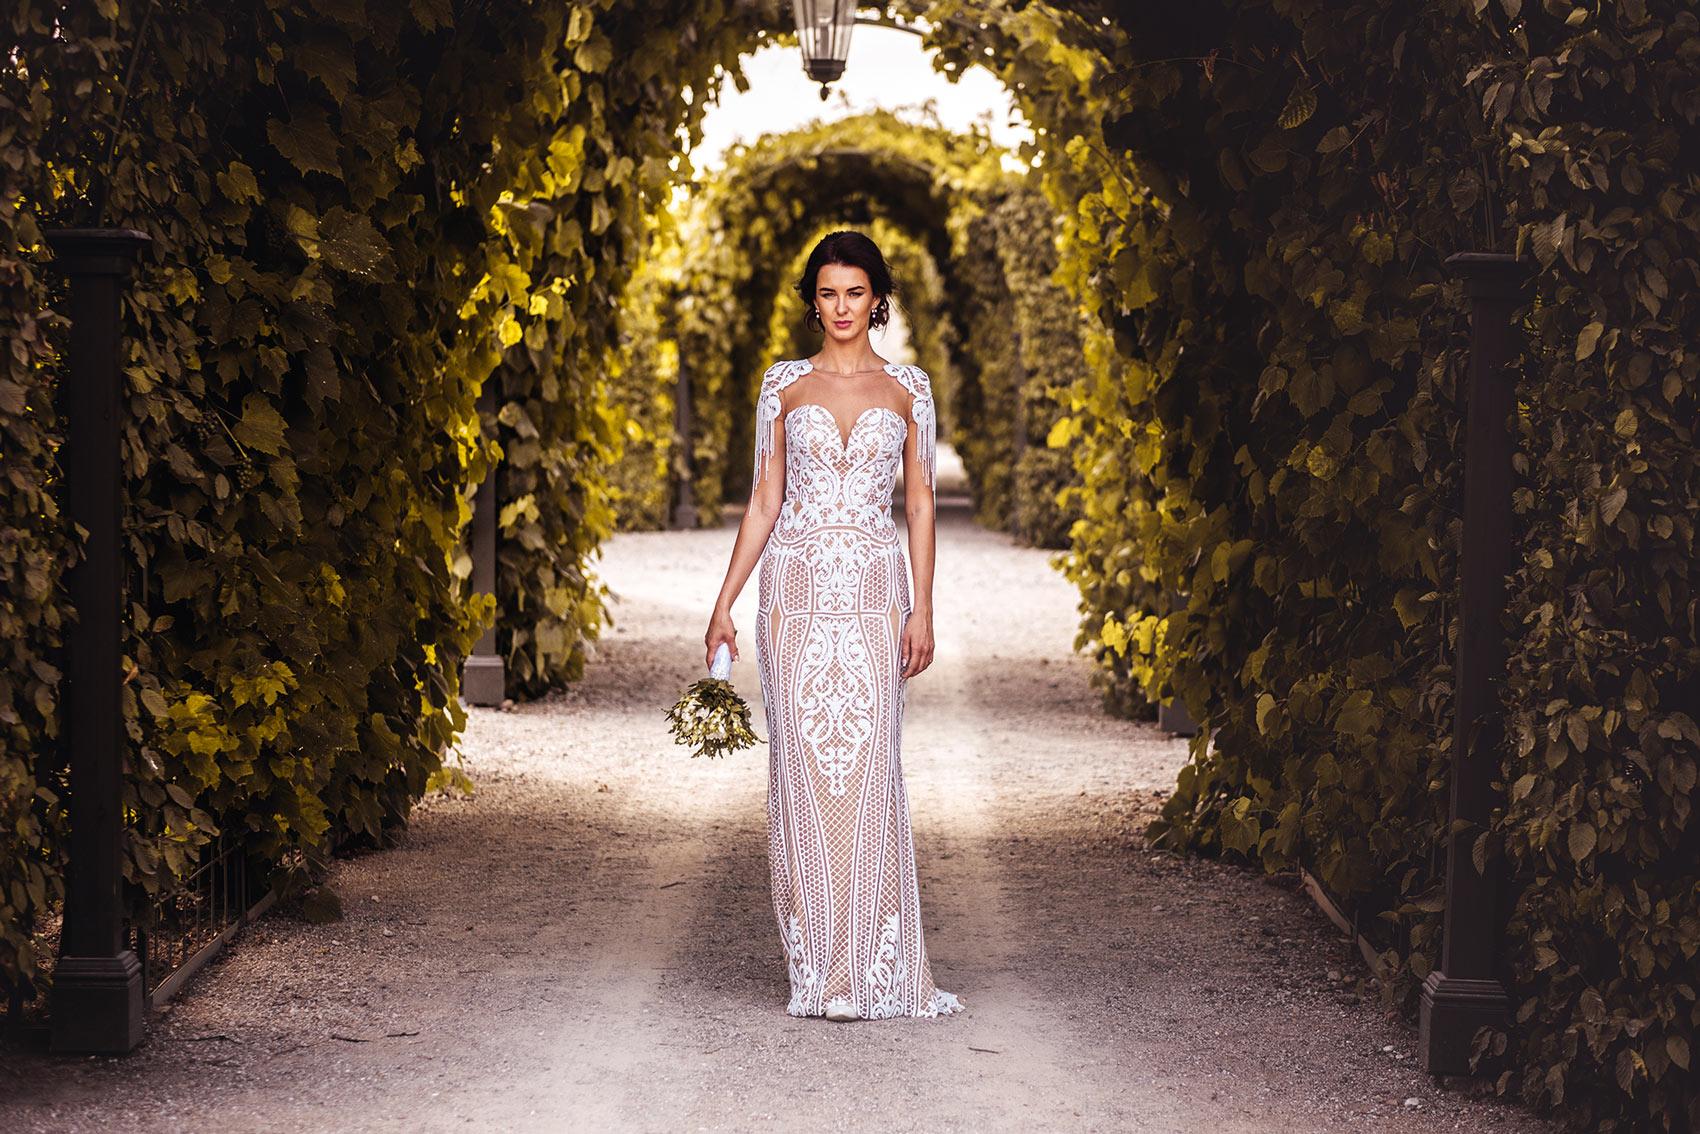 robe mariage automne 2021